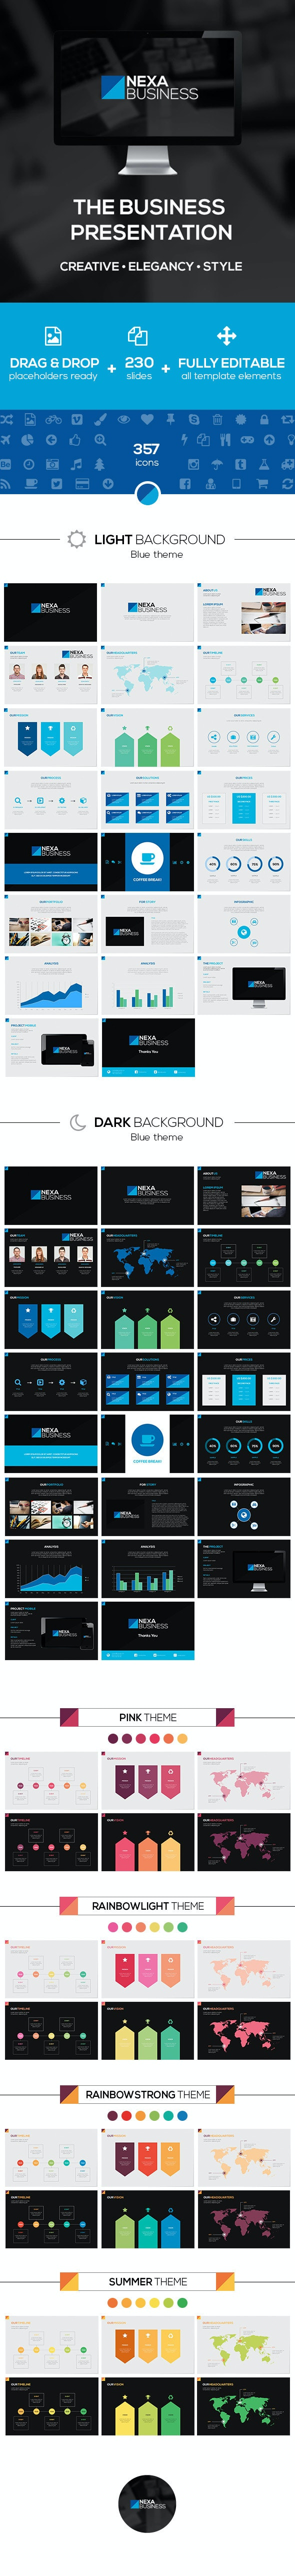 Nexa Business PowerPoint Template - Creative PowerPoint Templates